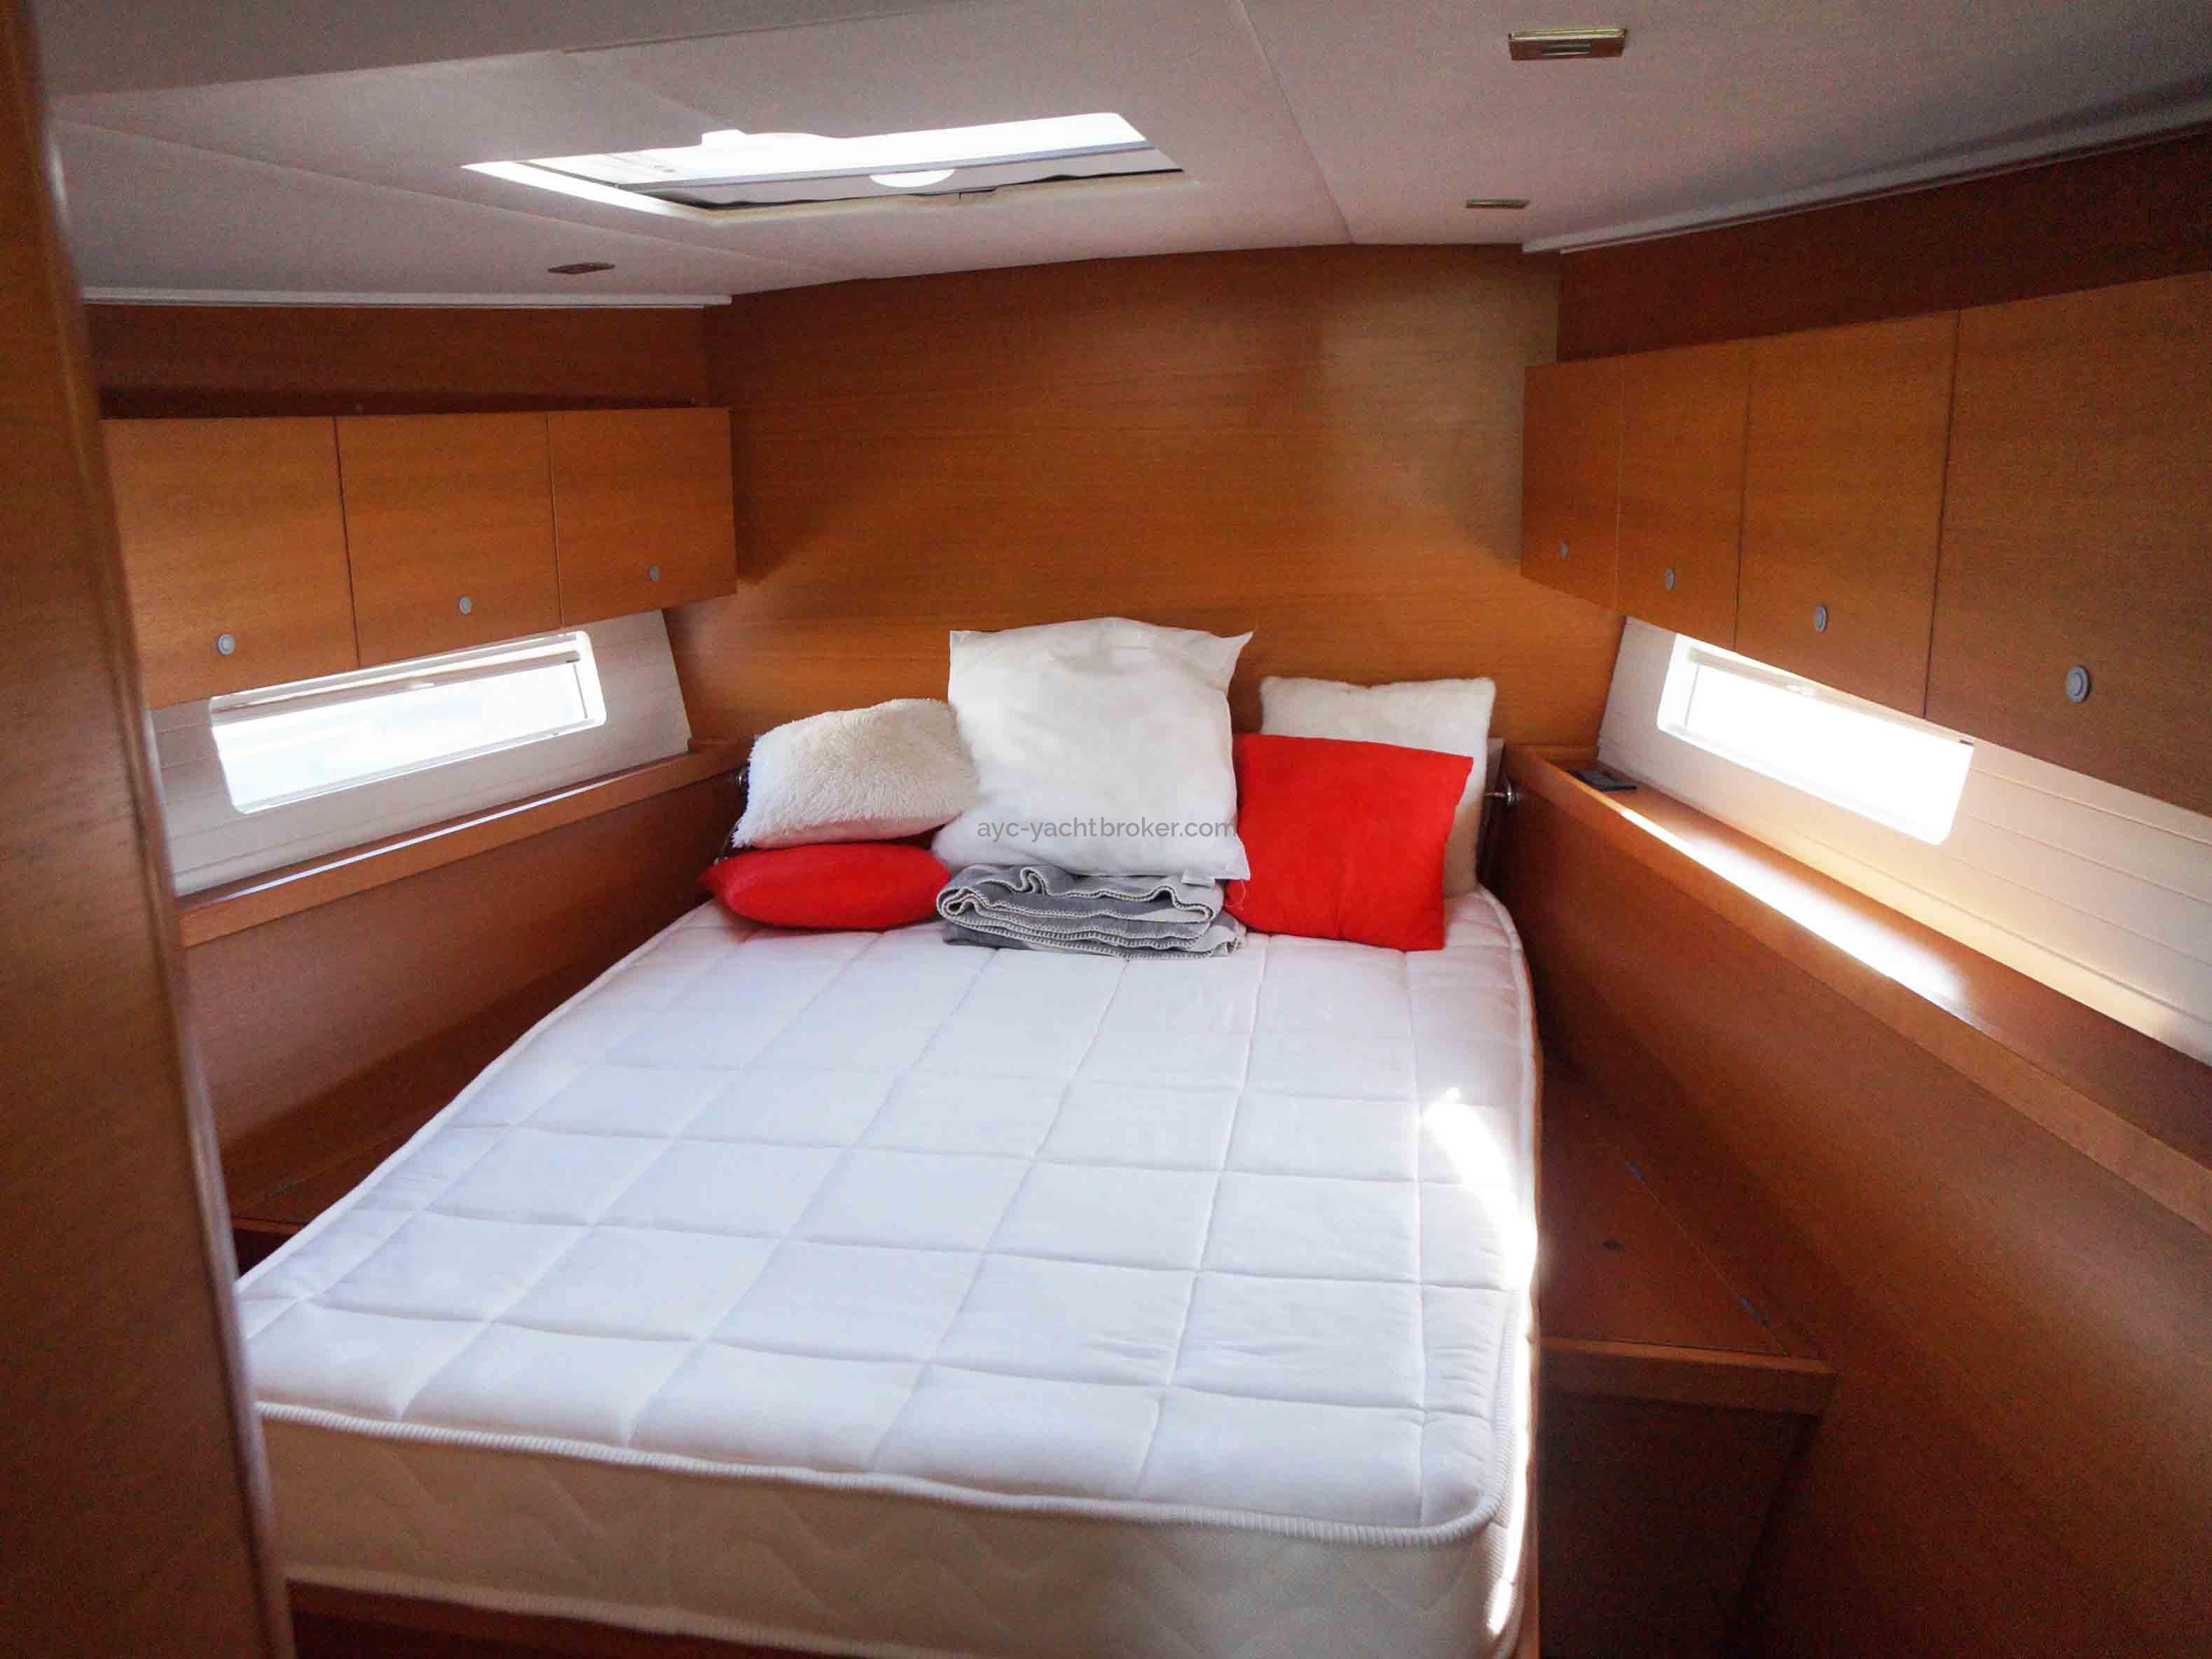 AYC Yachtbroker - GRAND SOLEIL 54 - cabine avant